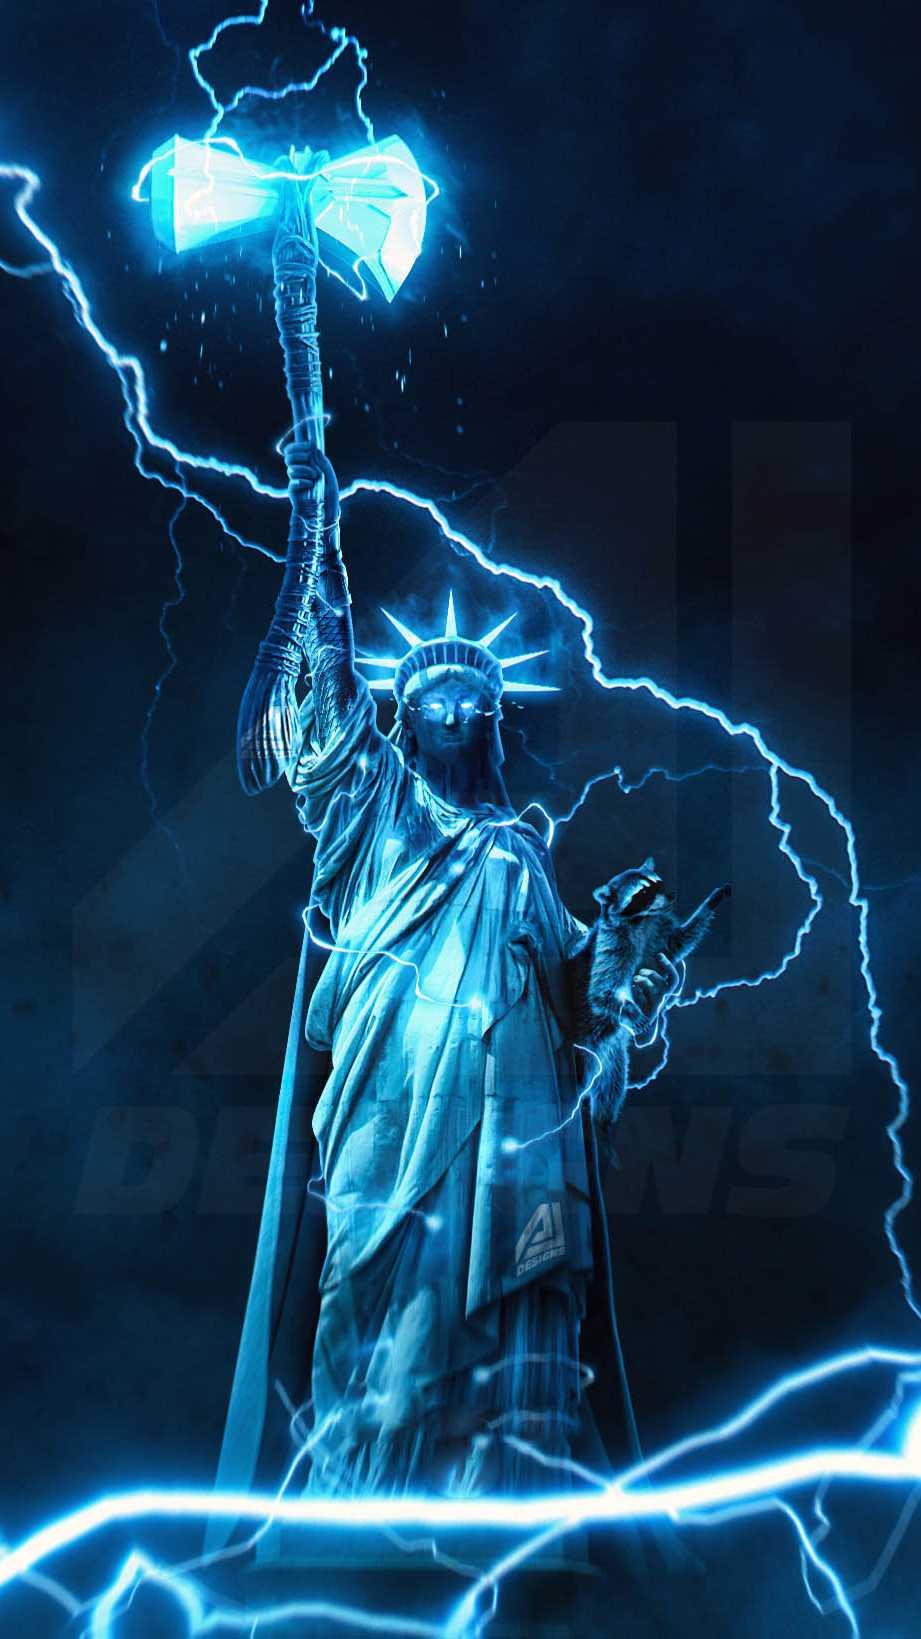 Avengers Statue of Liberty Stormbreaker iPhone Wallpaper